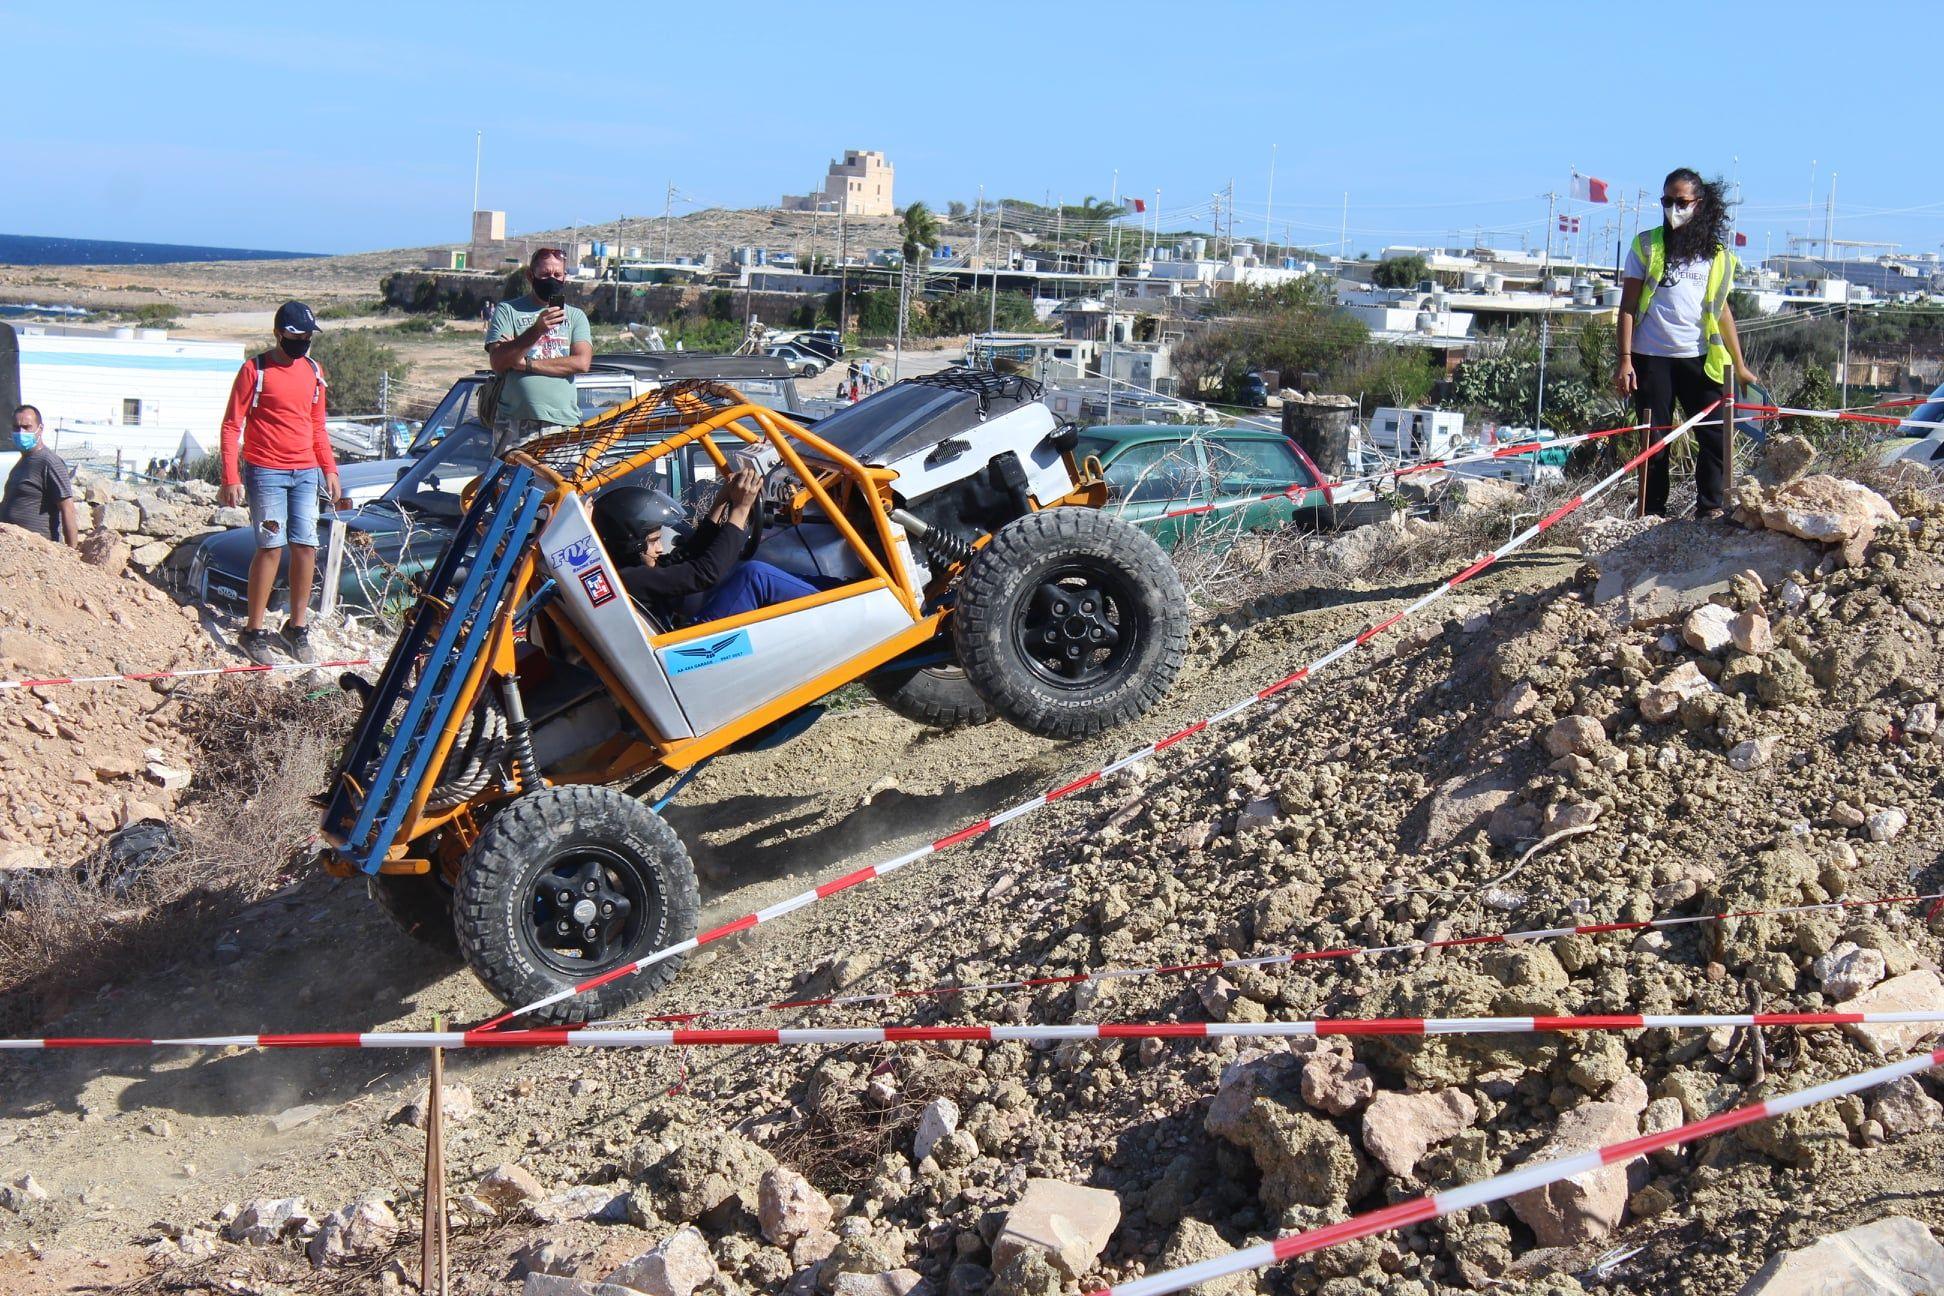 All Wheel Drive Club Malta – 1st Trials Races for 2020/21 Season